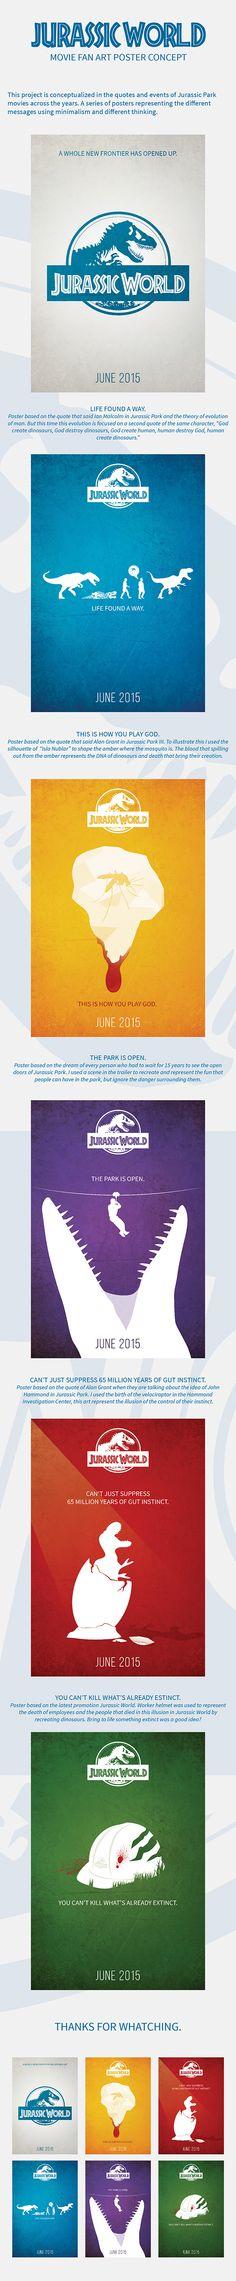 Jurassic World: Fan Art Posters Concept on Behance